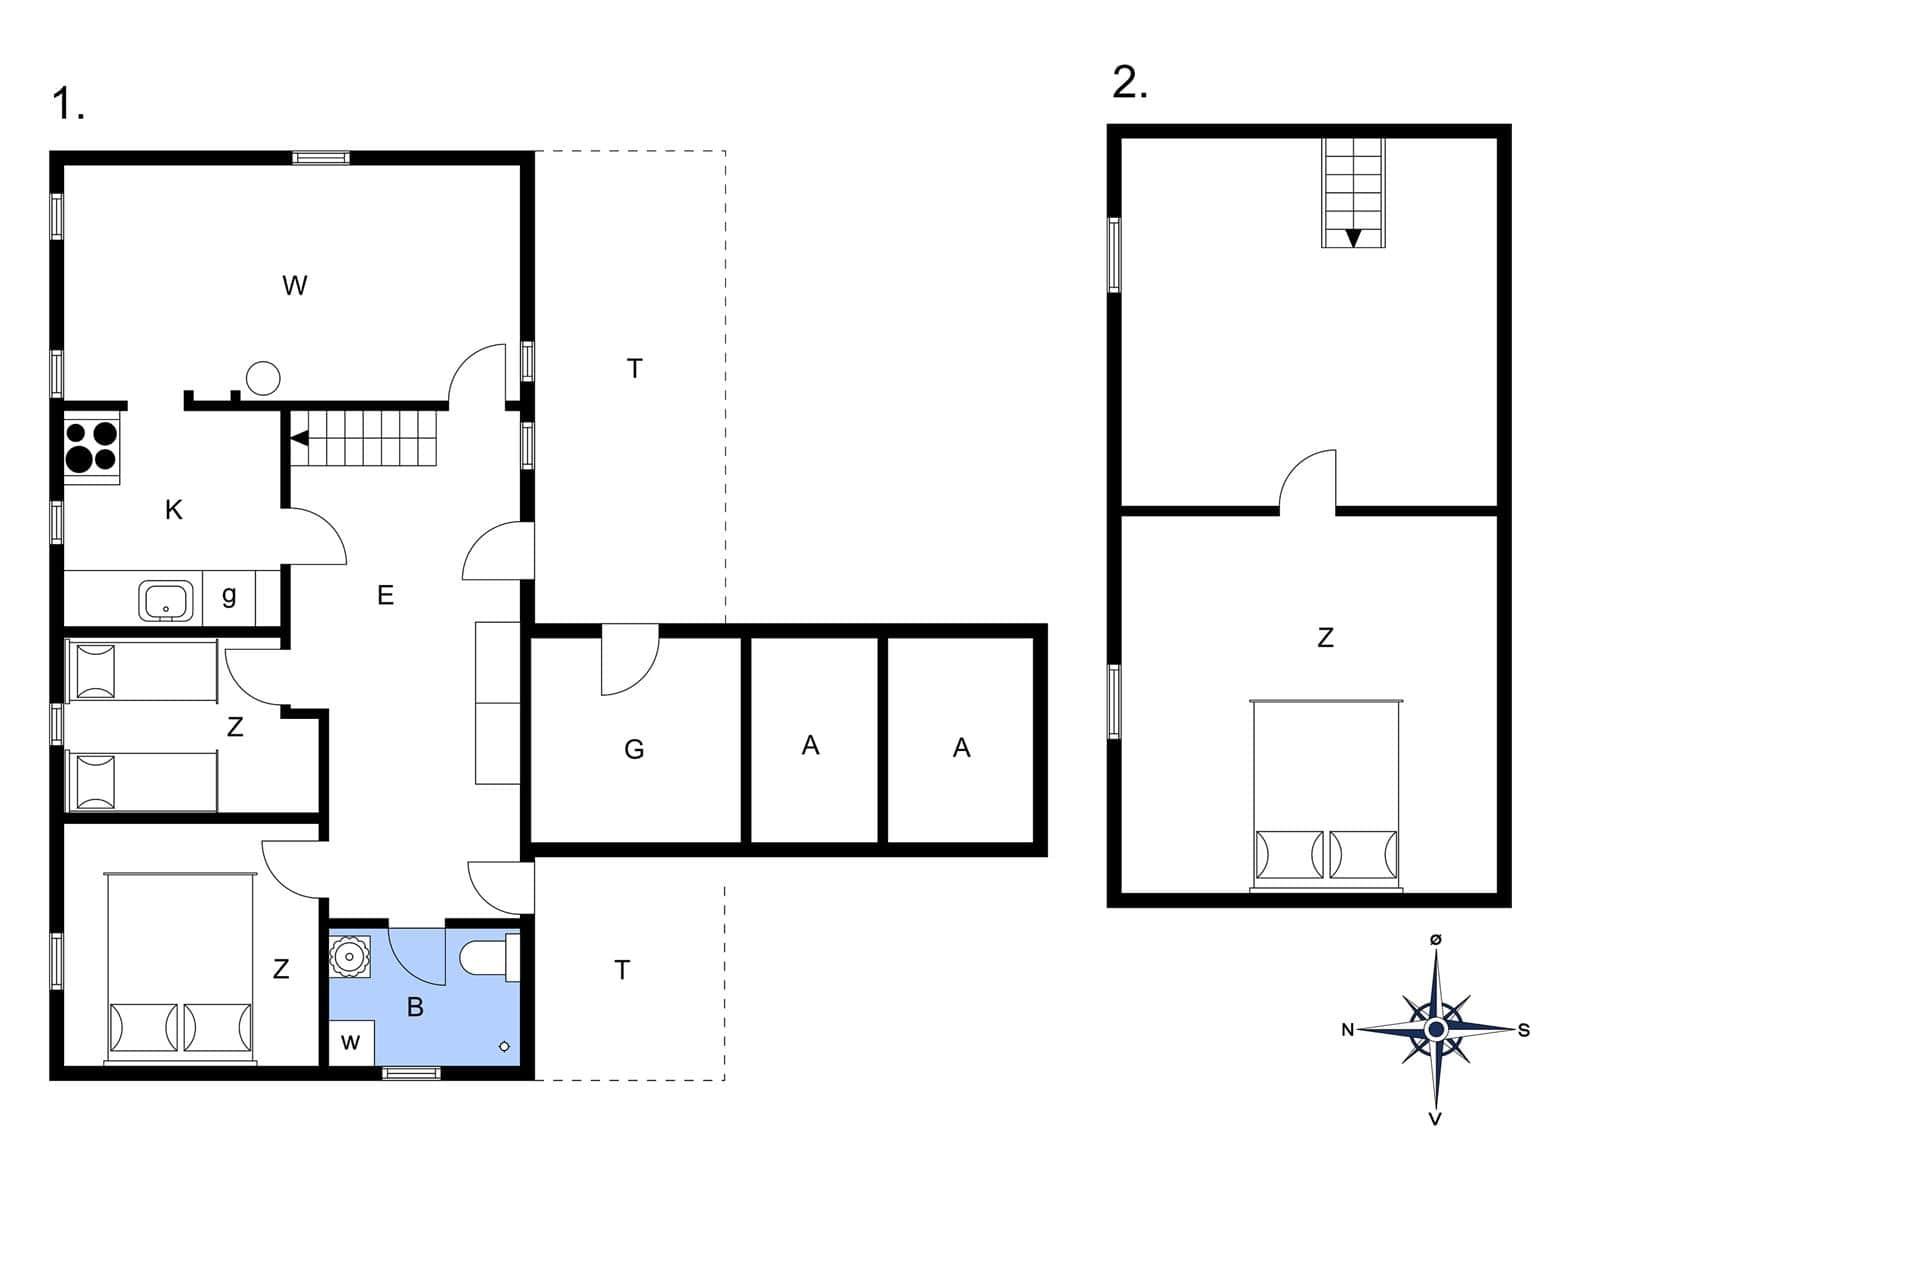 ferienhaus mit internet jb831 slettestrand jammerbucht. Black Bedroom Furniture Sets. Home Design Ideas